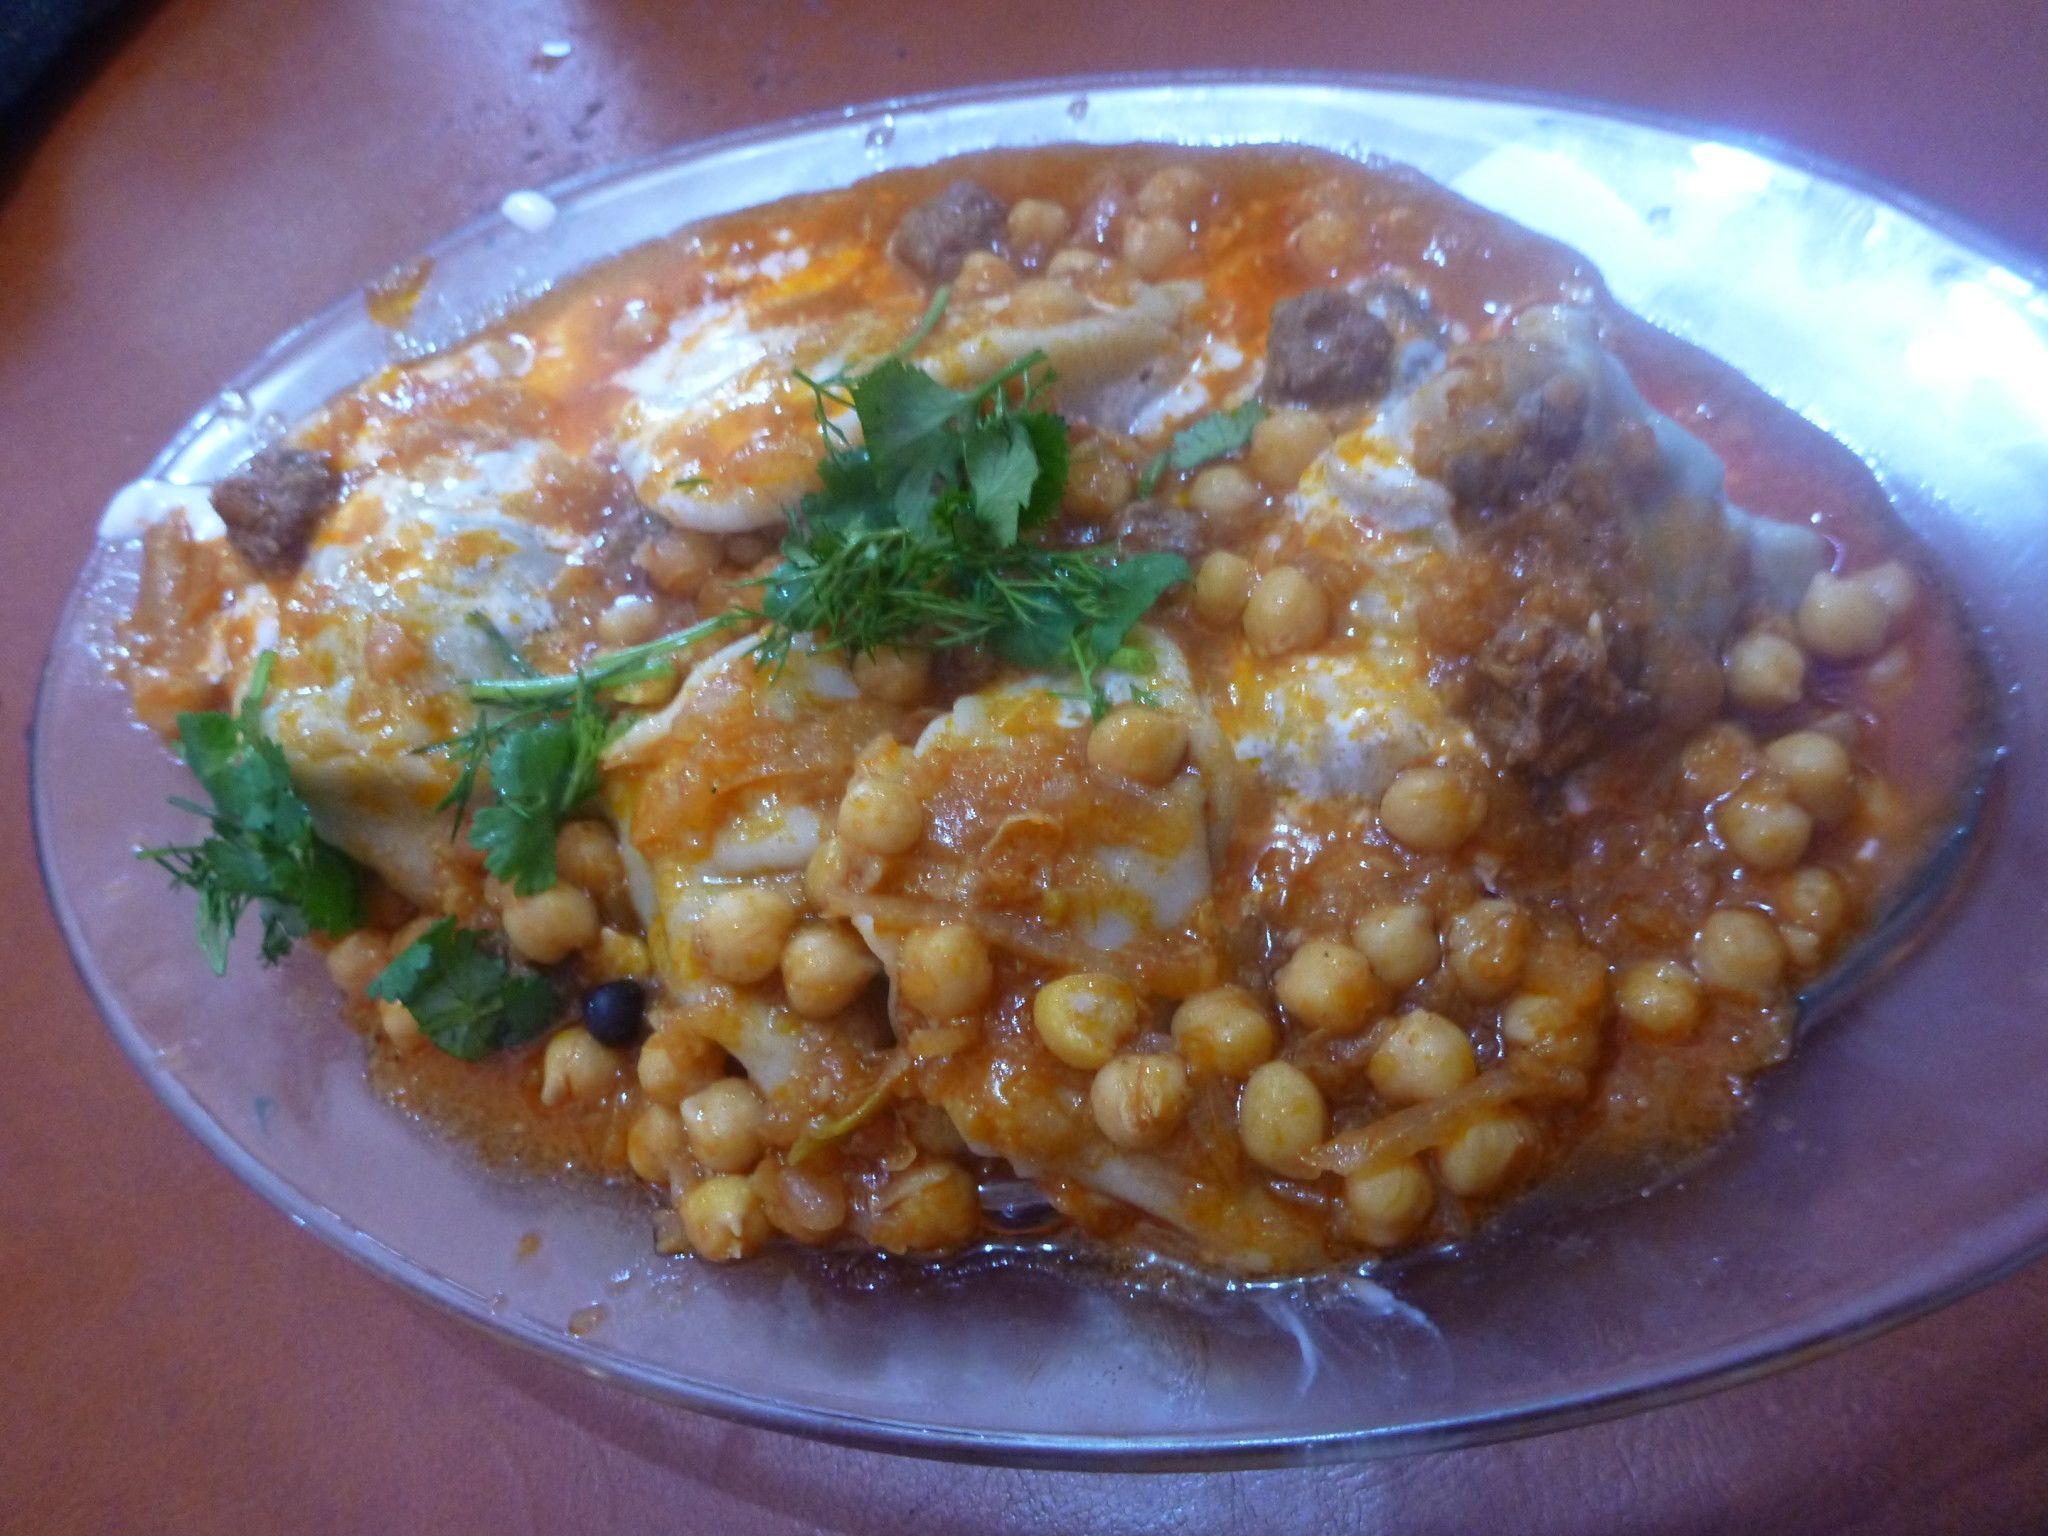 Friday's Featured Food: Eating the National Dish Mantoo in Sunatala Restaurant, Masa e Sharif, Afghanistan